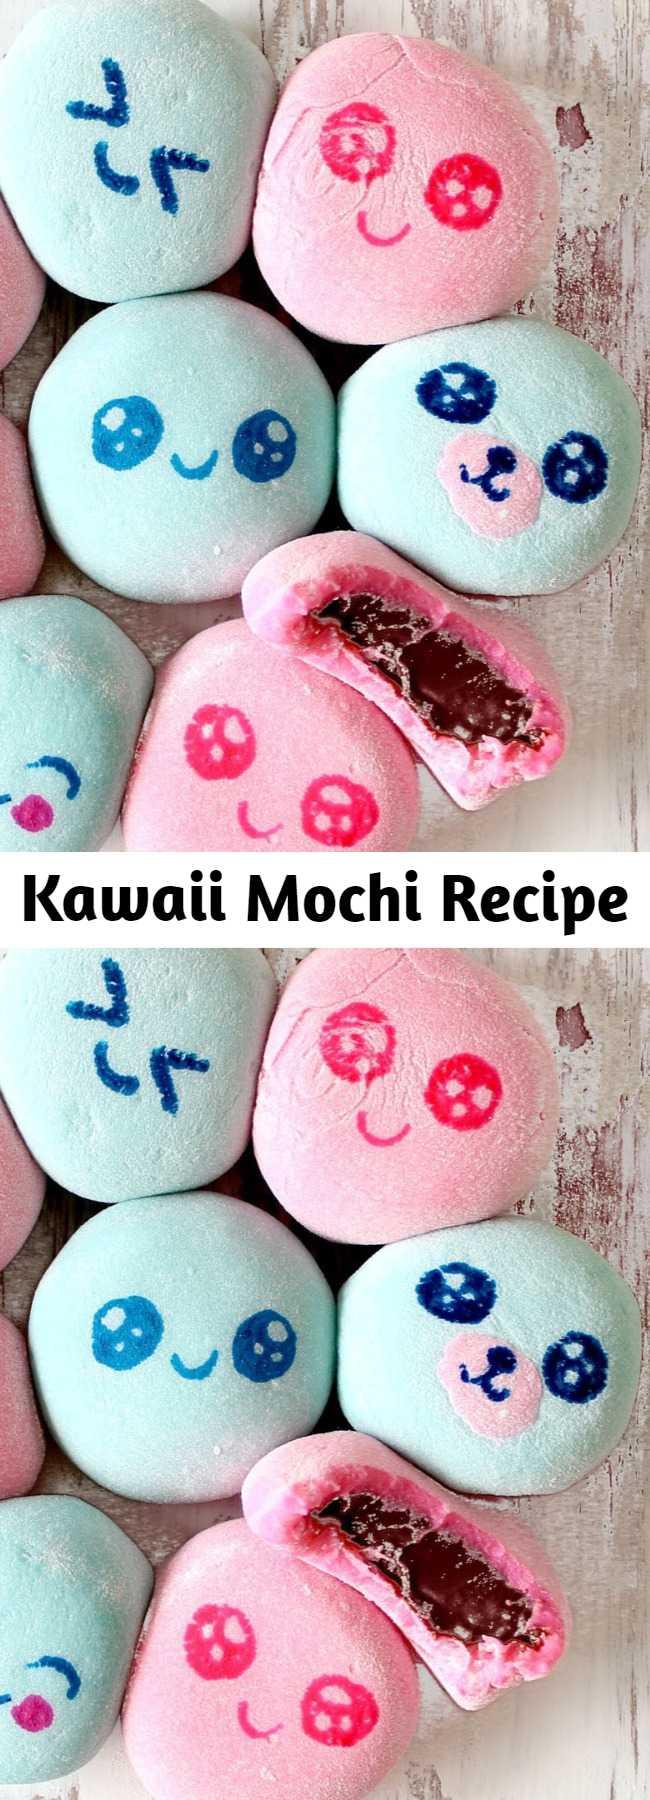 Kawaii Mochi Recipe